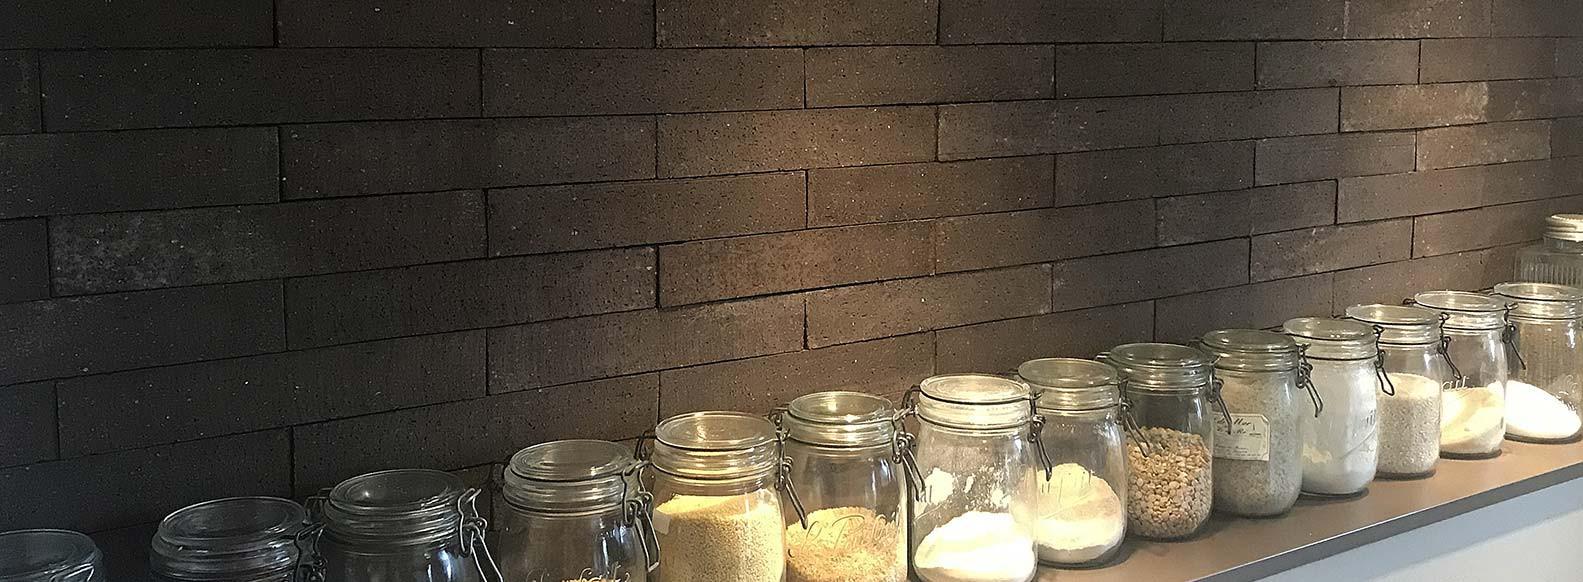 Sienna Pre-aged Facing Brick